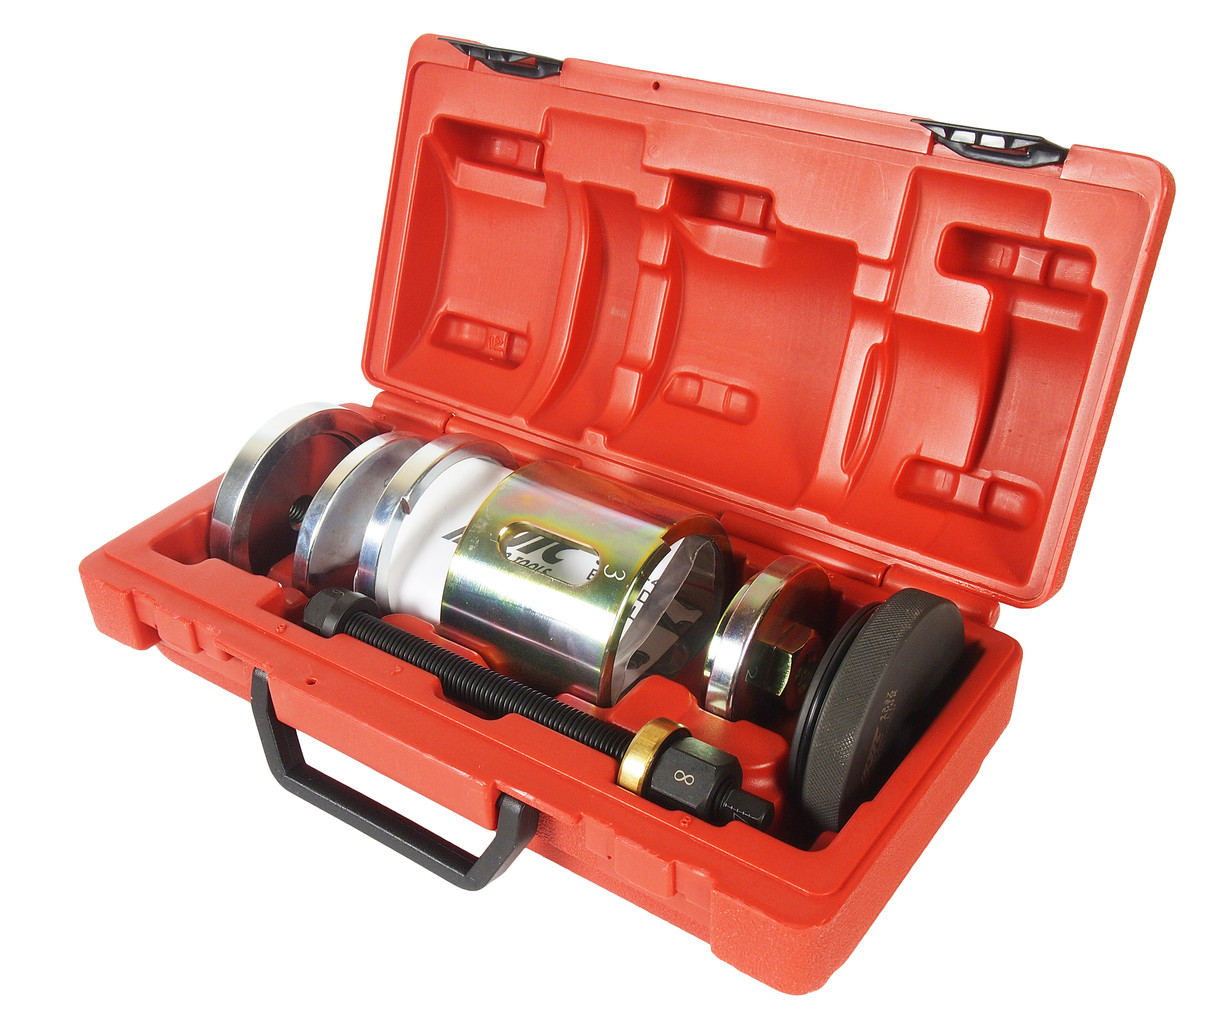 JTC Набор инструментов для демонтажа/монтажа сайлентблоков (MERCEDES W212,207,212,216,221,222,231) JTC